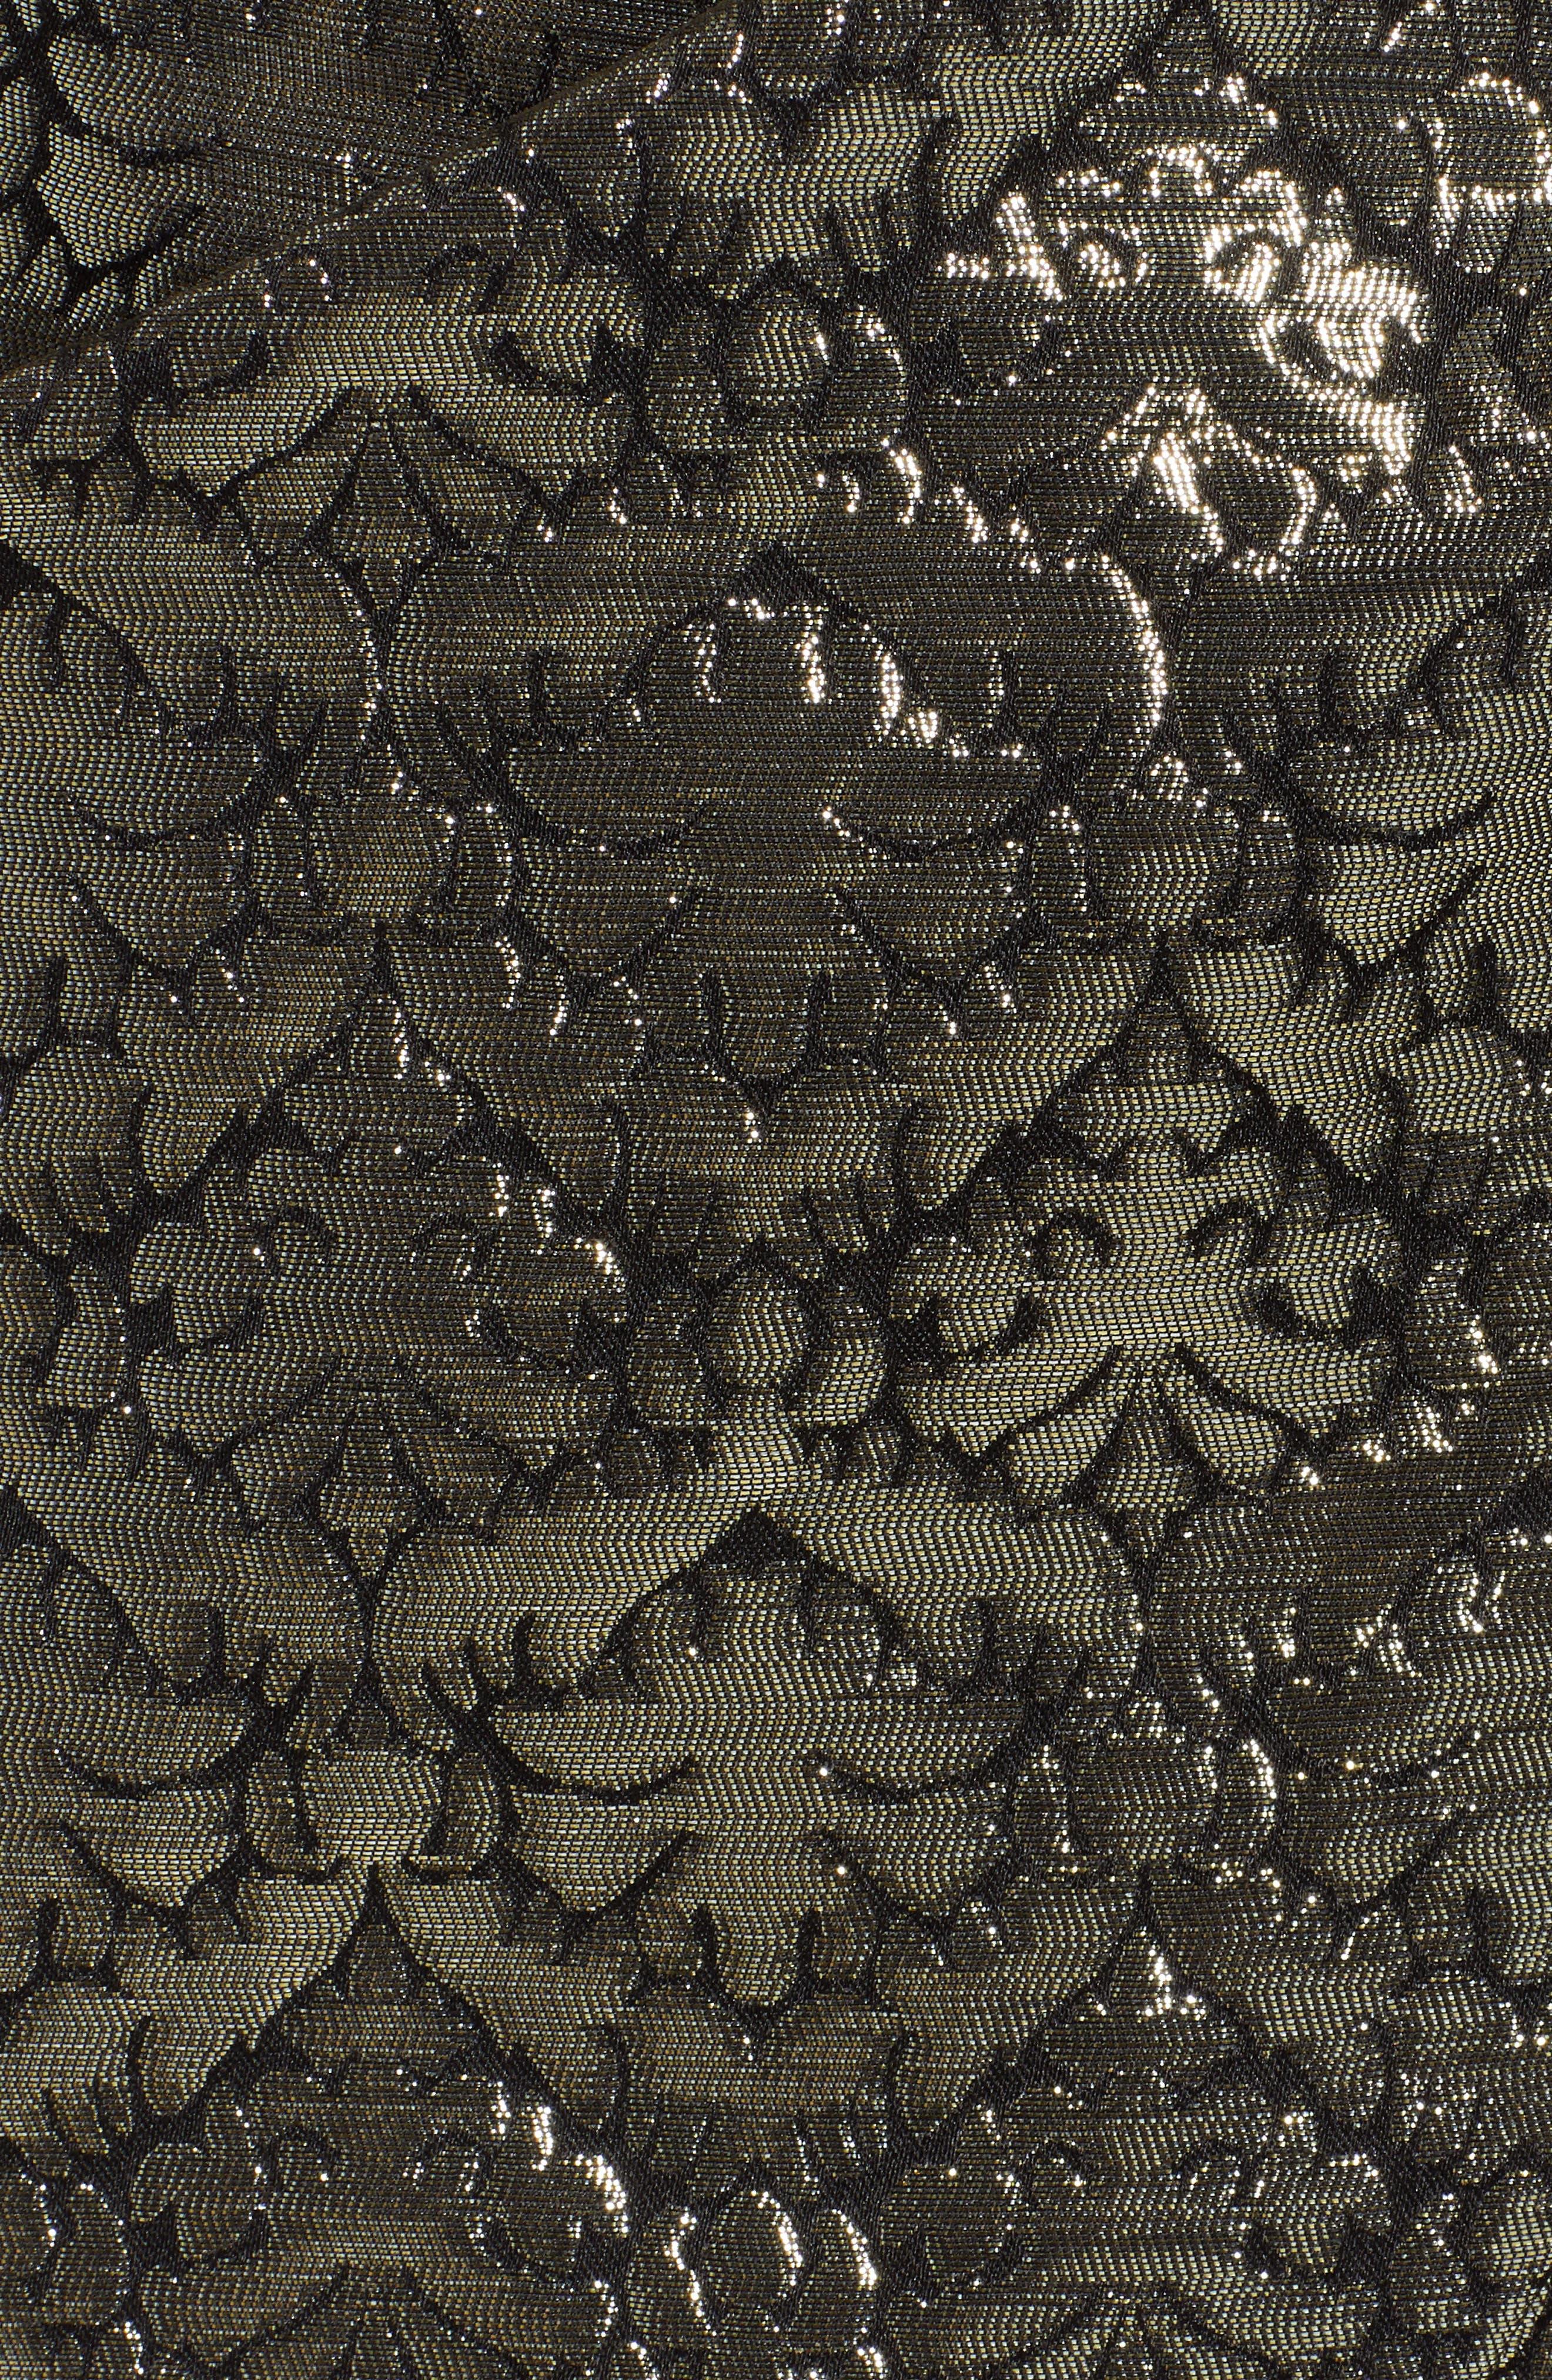 REBECCA MINKOFF, Augustina Shimmering Jacquard Faux Wrap Skirt, Alternate thumbnail 5, color, 710